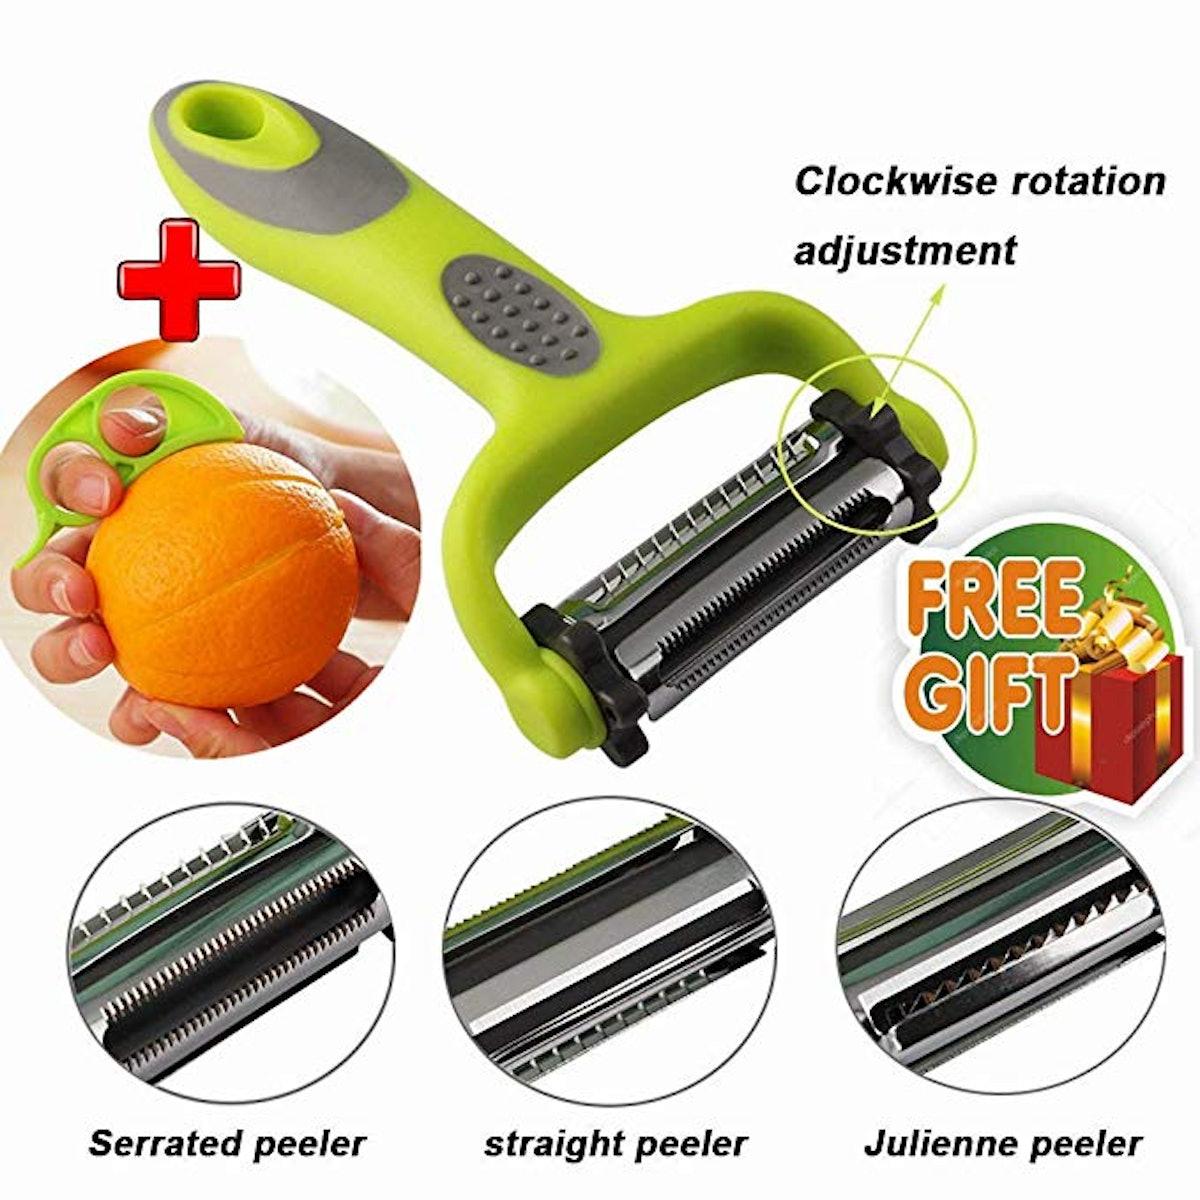 PICNIC CAMPING Multi-function 3-In-1 Vegetable Peeler